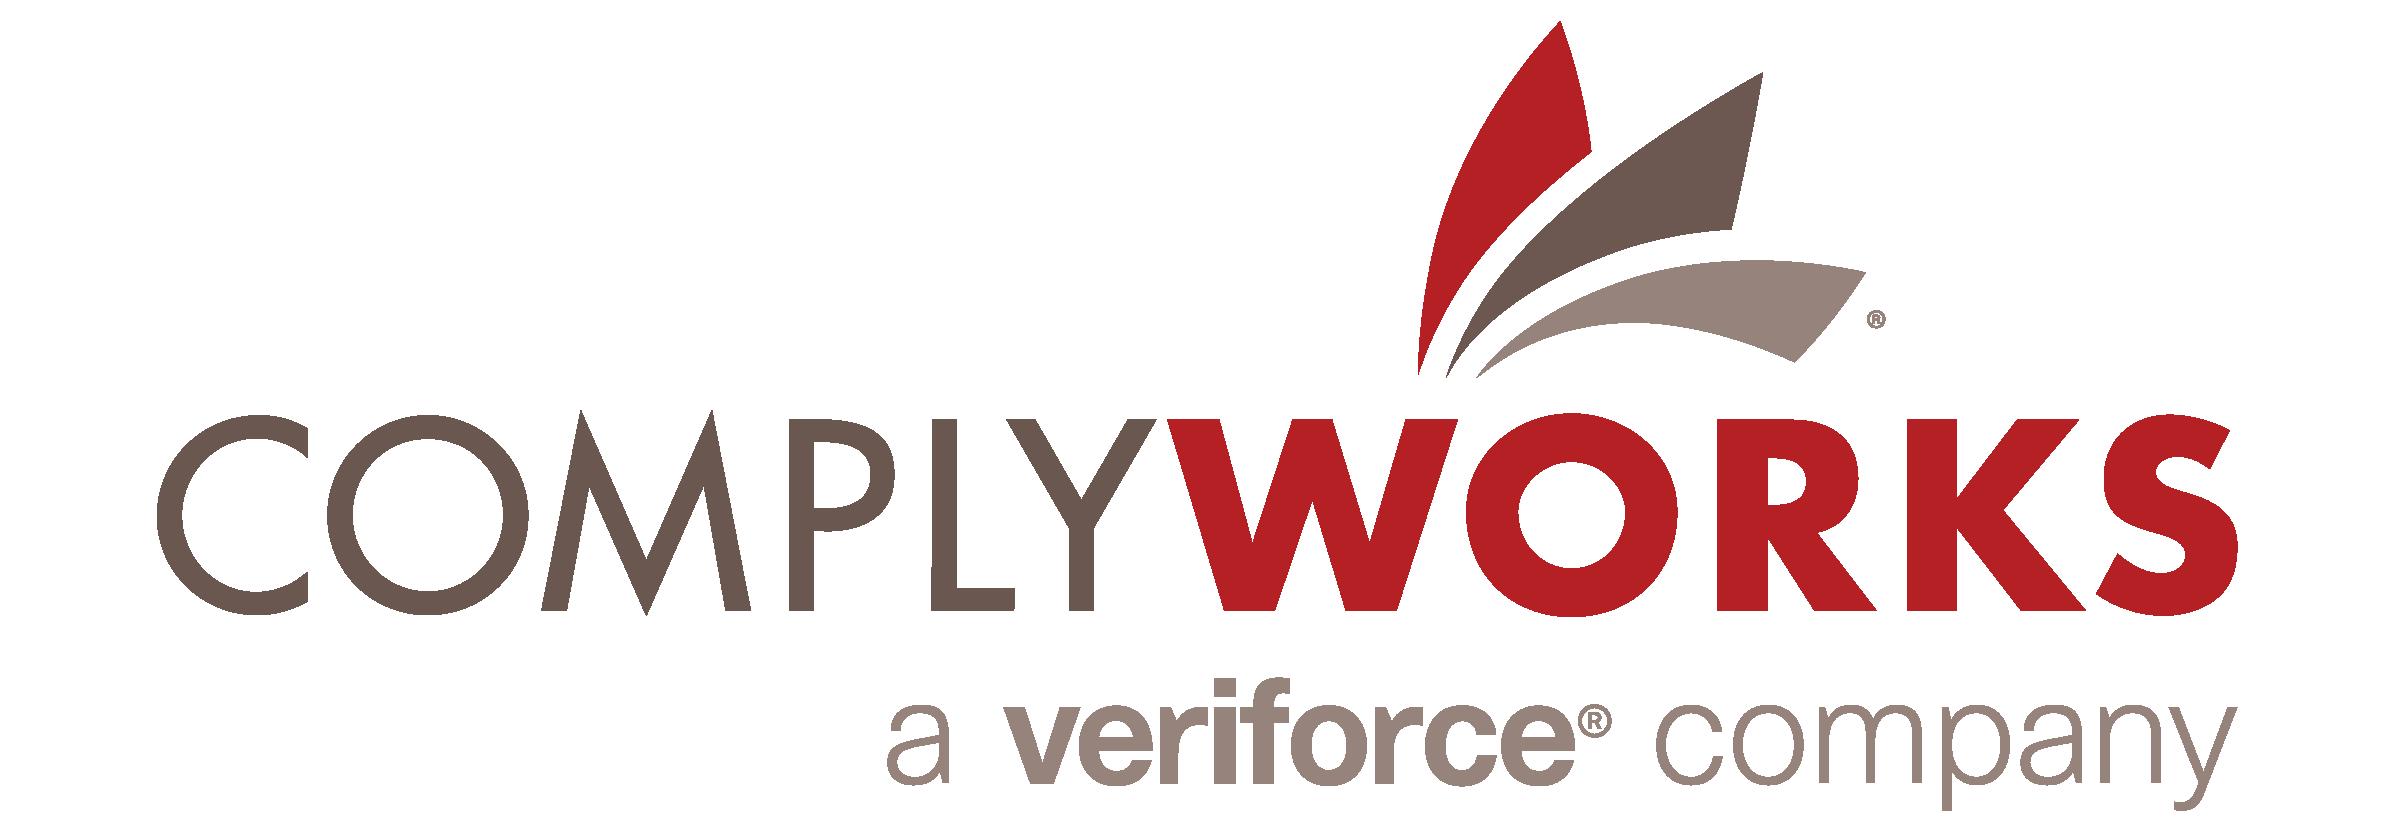 Comply-works-Hoffman-Elite-Enterprises-Ltd